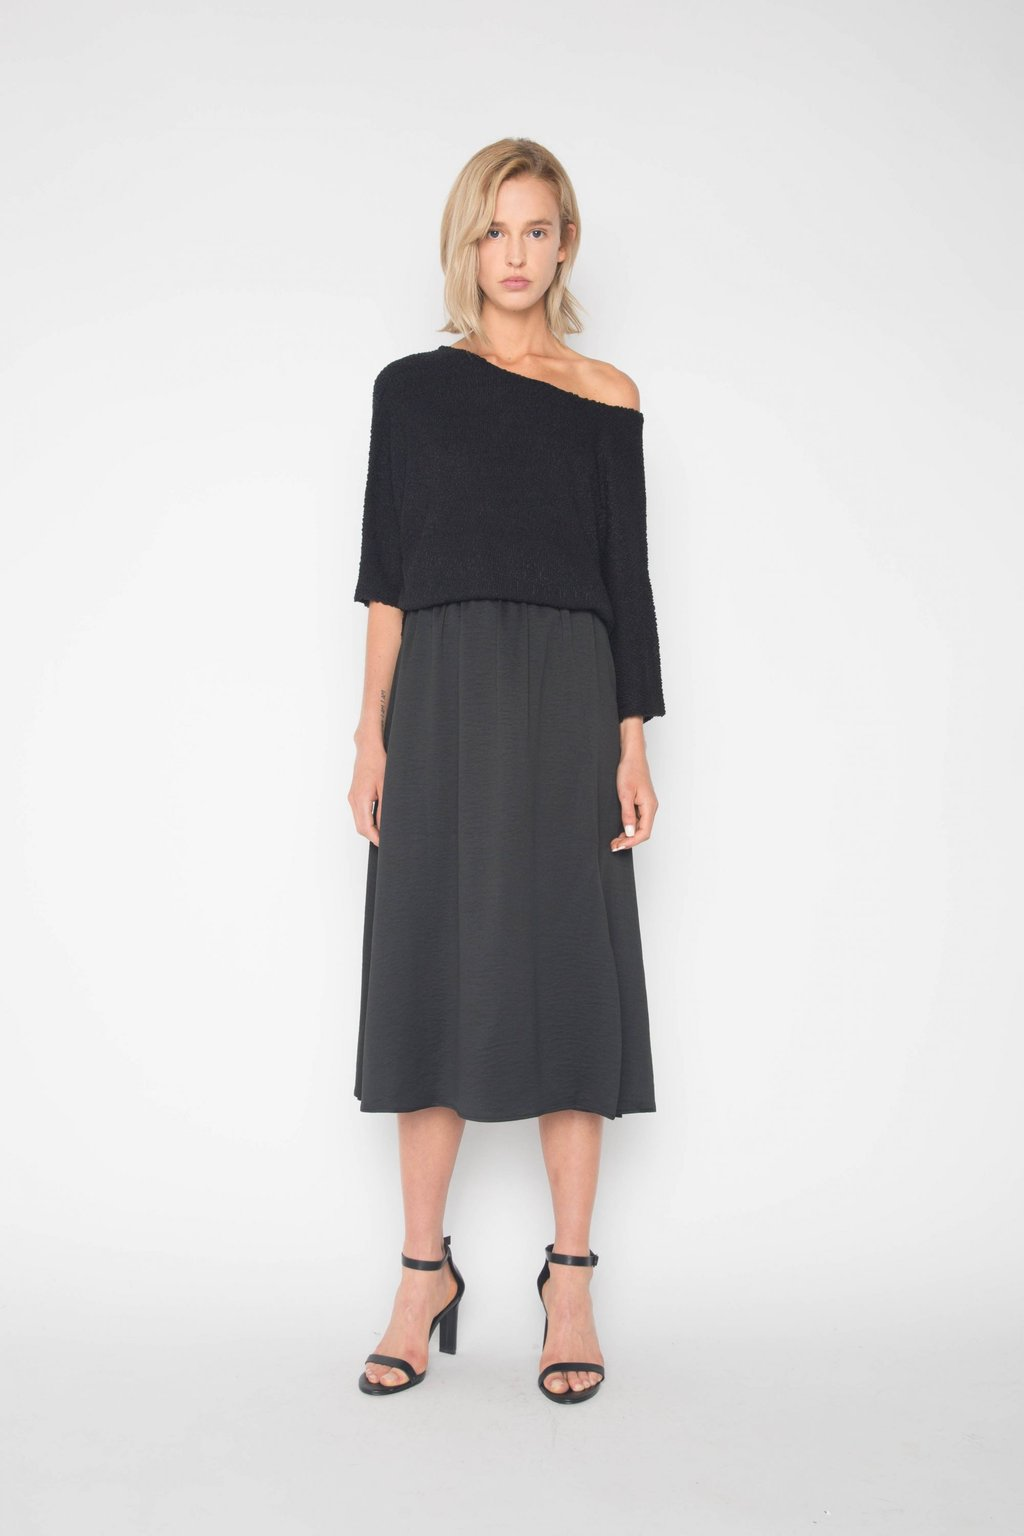 Sweater 1322 Black 1